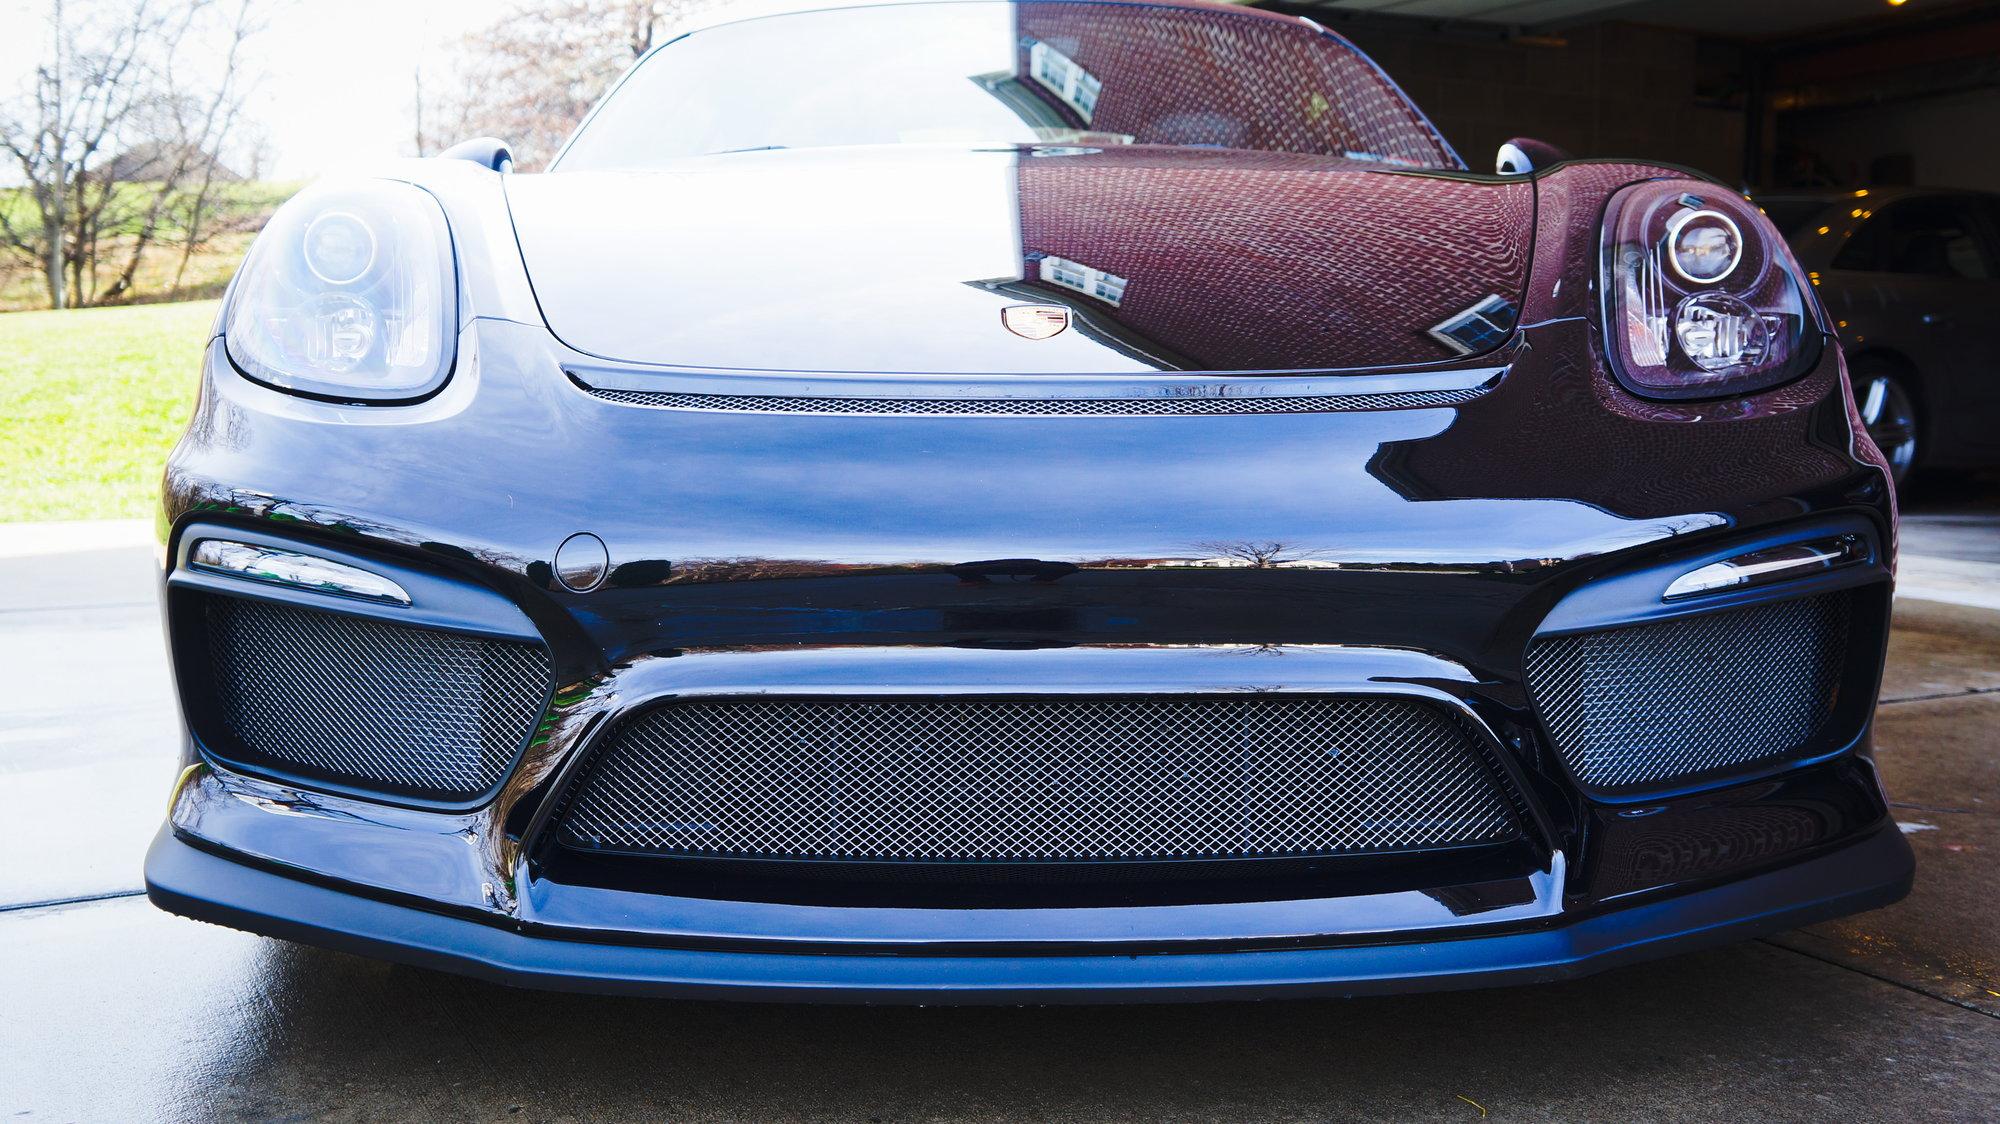 paint front wire mesh grill? - Rennlist - Porsche Discussion